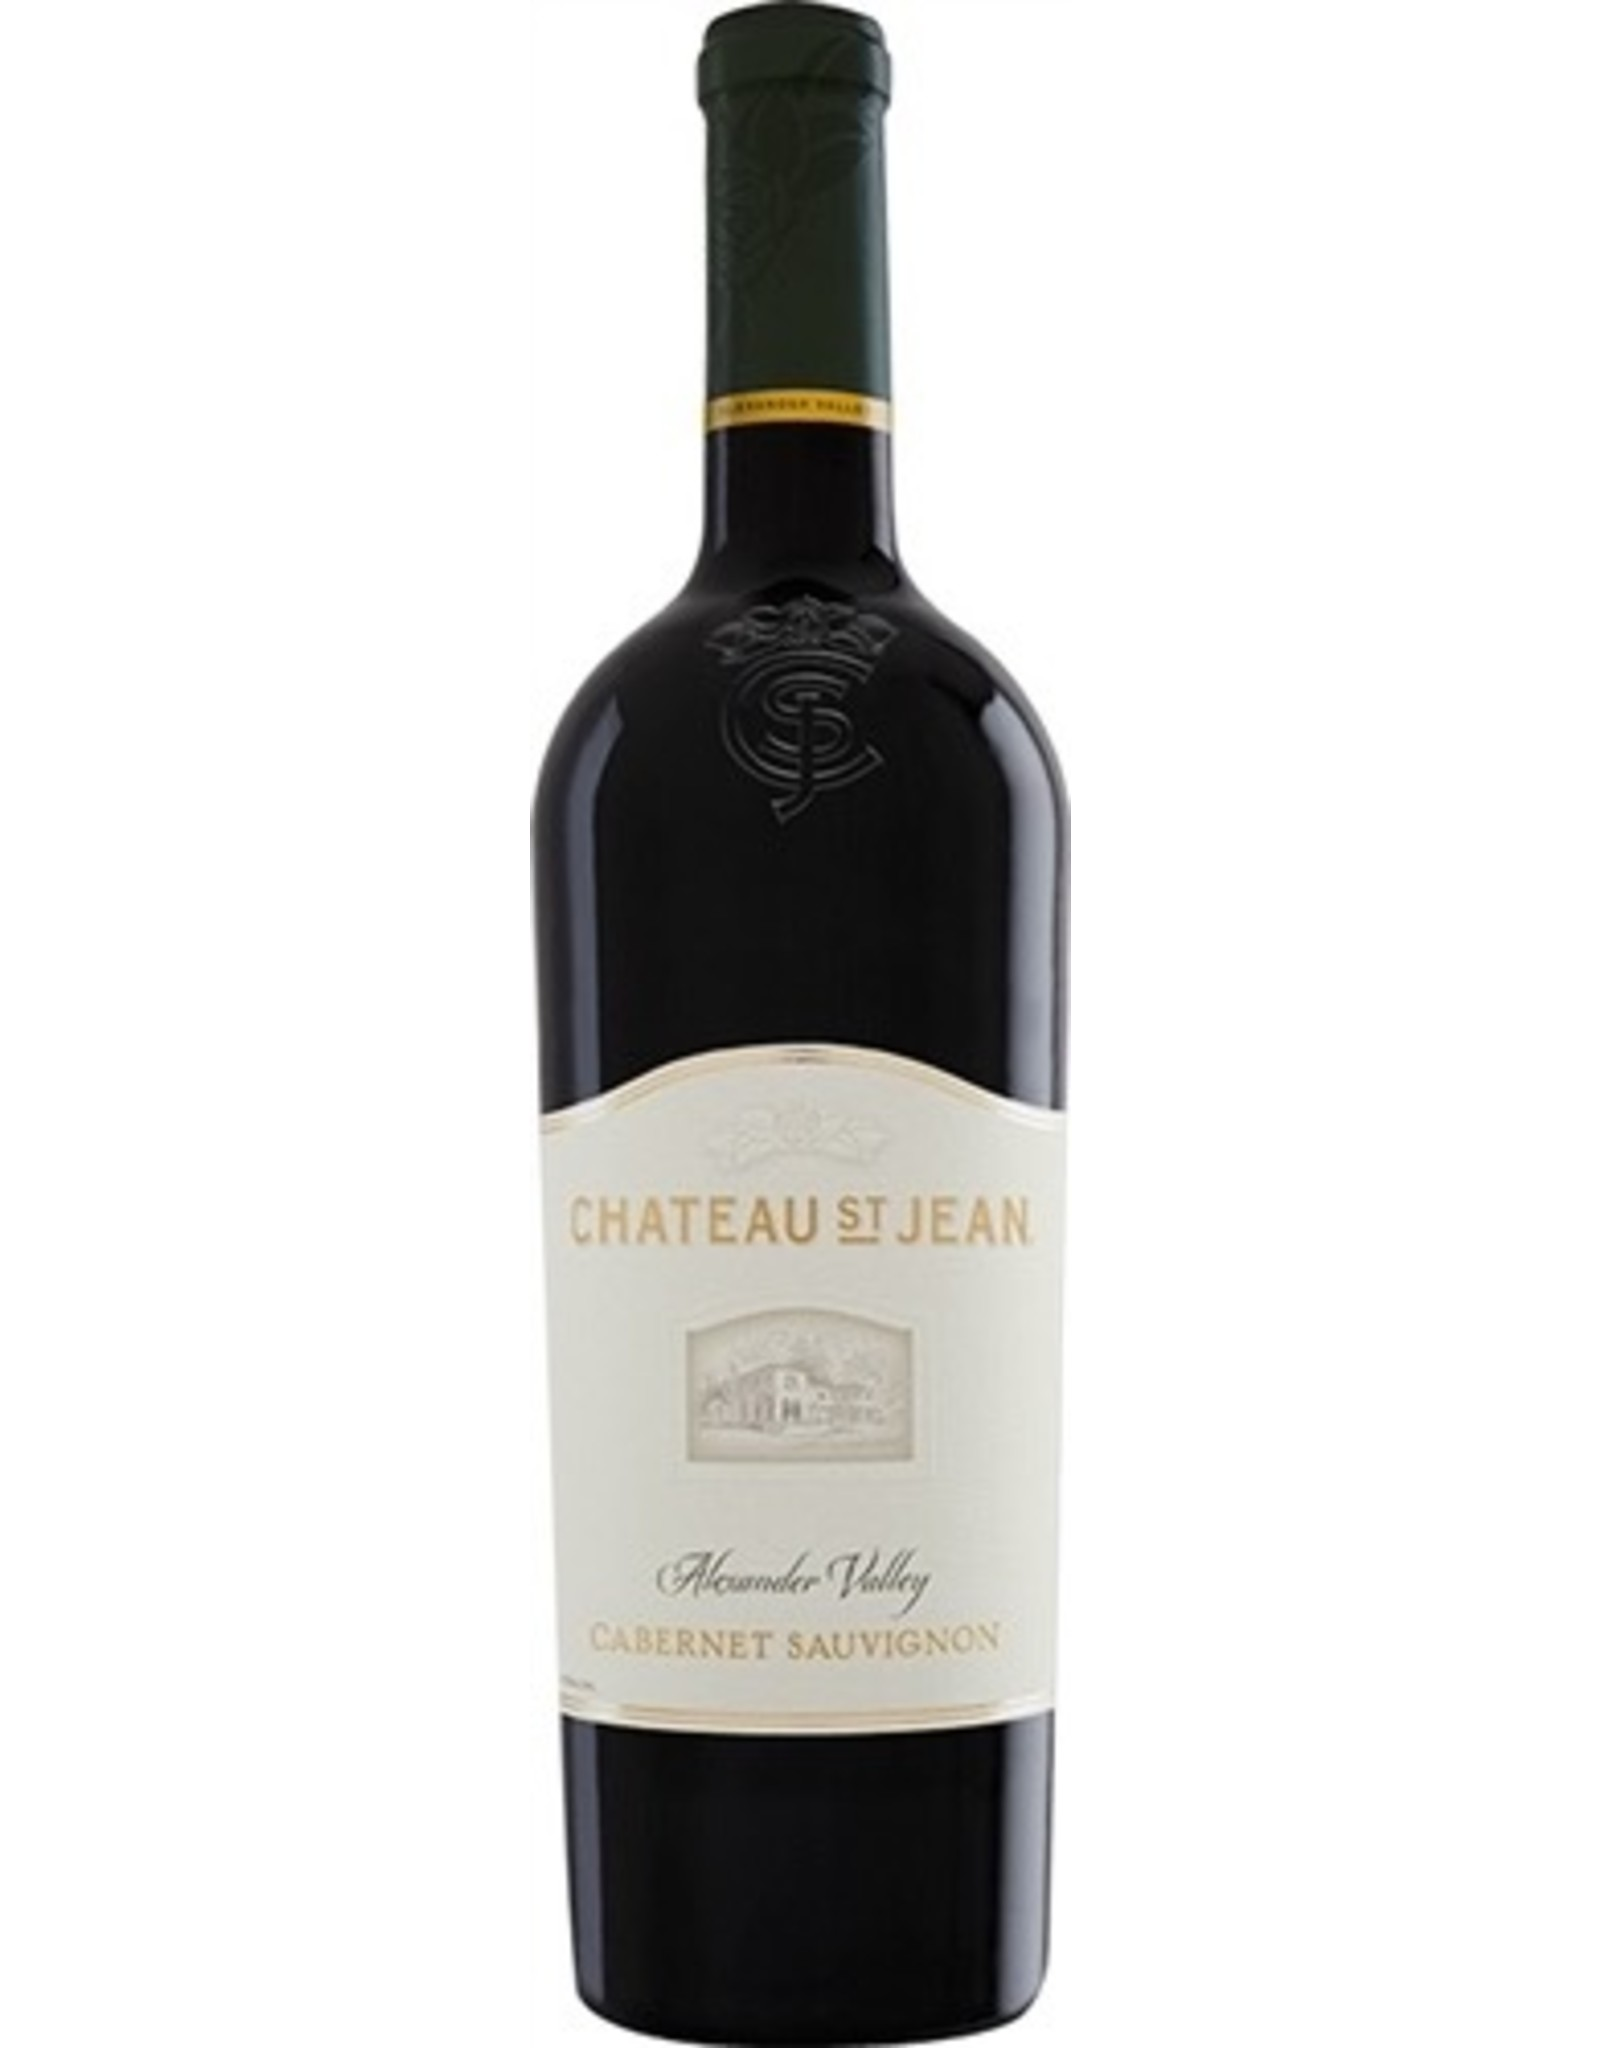 Red Wine 2011, Chateau St. Jean, Cabernet Sauvignon, Alexander Valley, Sonoma, California, 14.4% Alc, RP90, WS91, Tw91